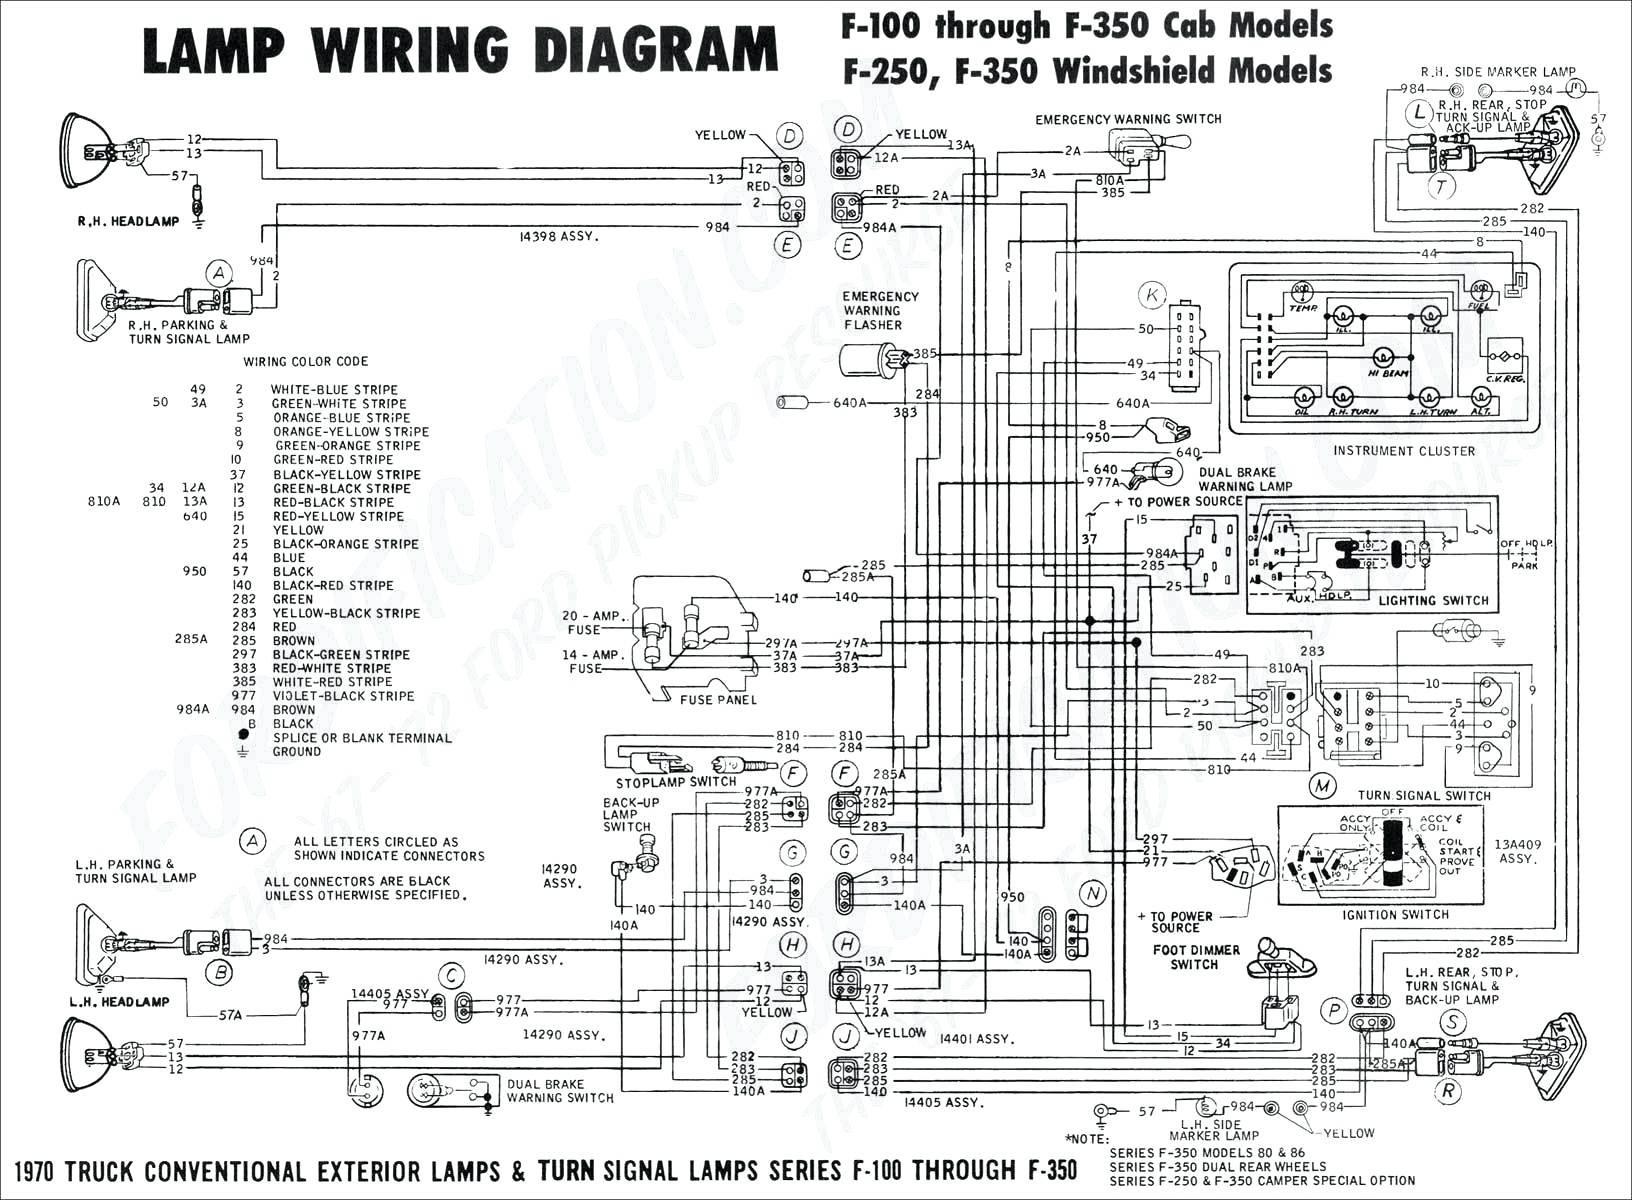 1977 Chevy Truck Vacuum Diagram 1973 Buick Riviera Vacuum Diagram Worksheet and Wiring Diagram • Of 1977 Chevy Truck Vacuum Diagram